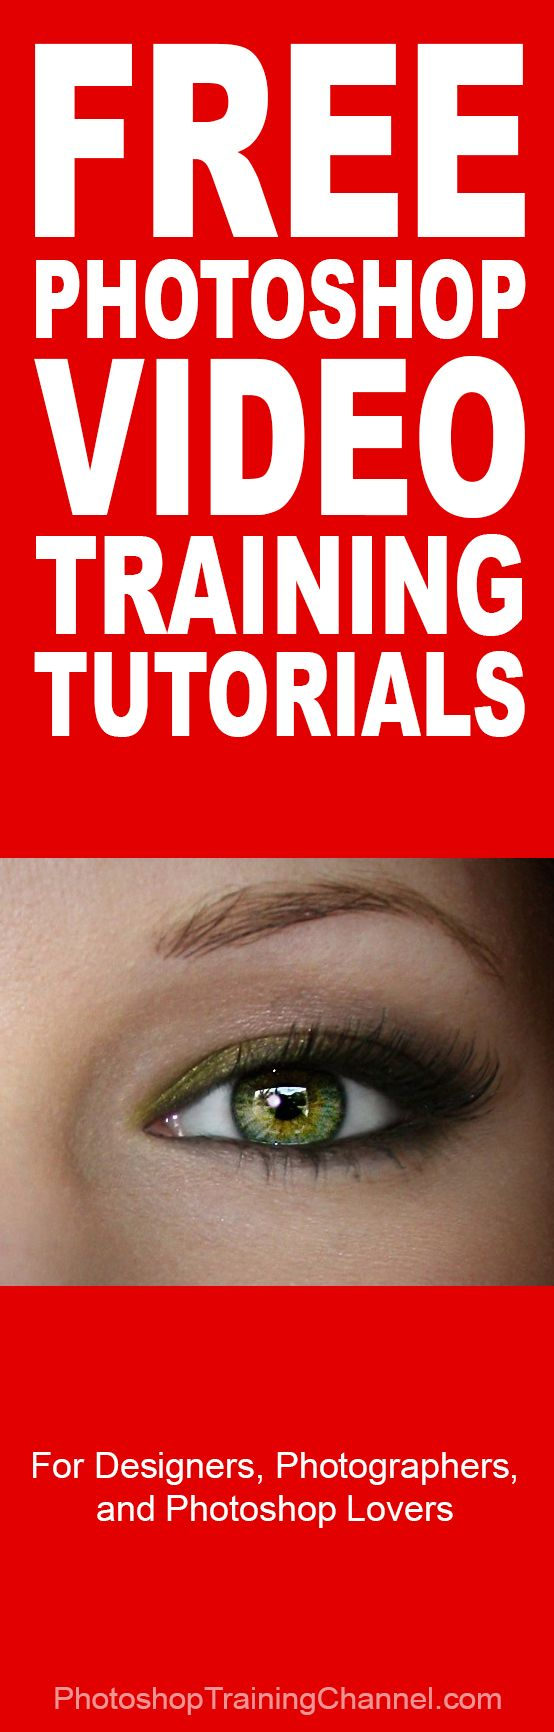 Free Photoshop video training http://photoshoptrainingchannel.com